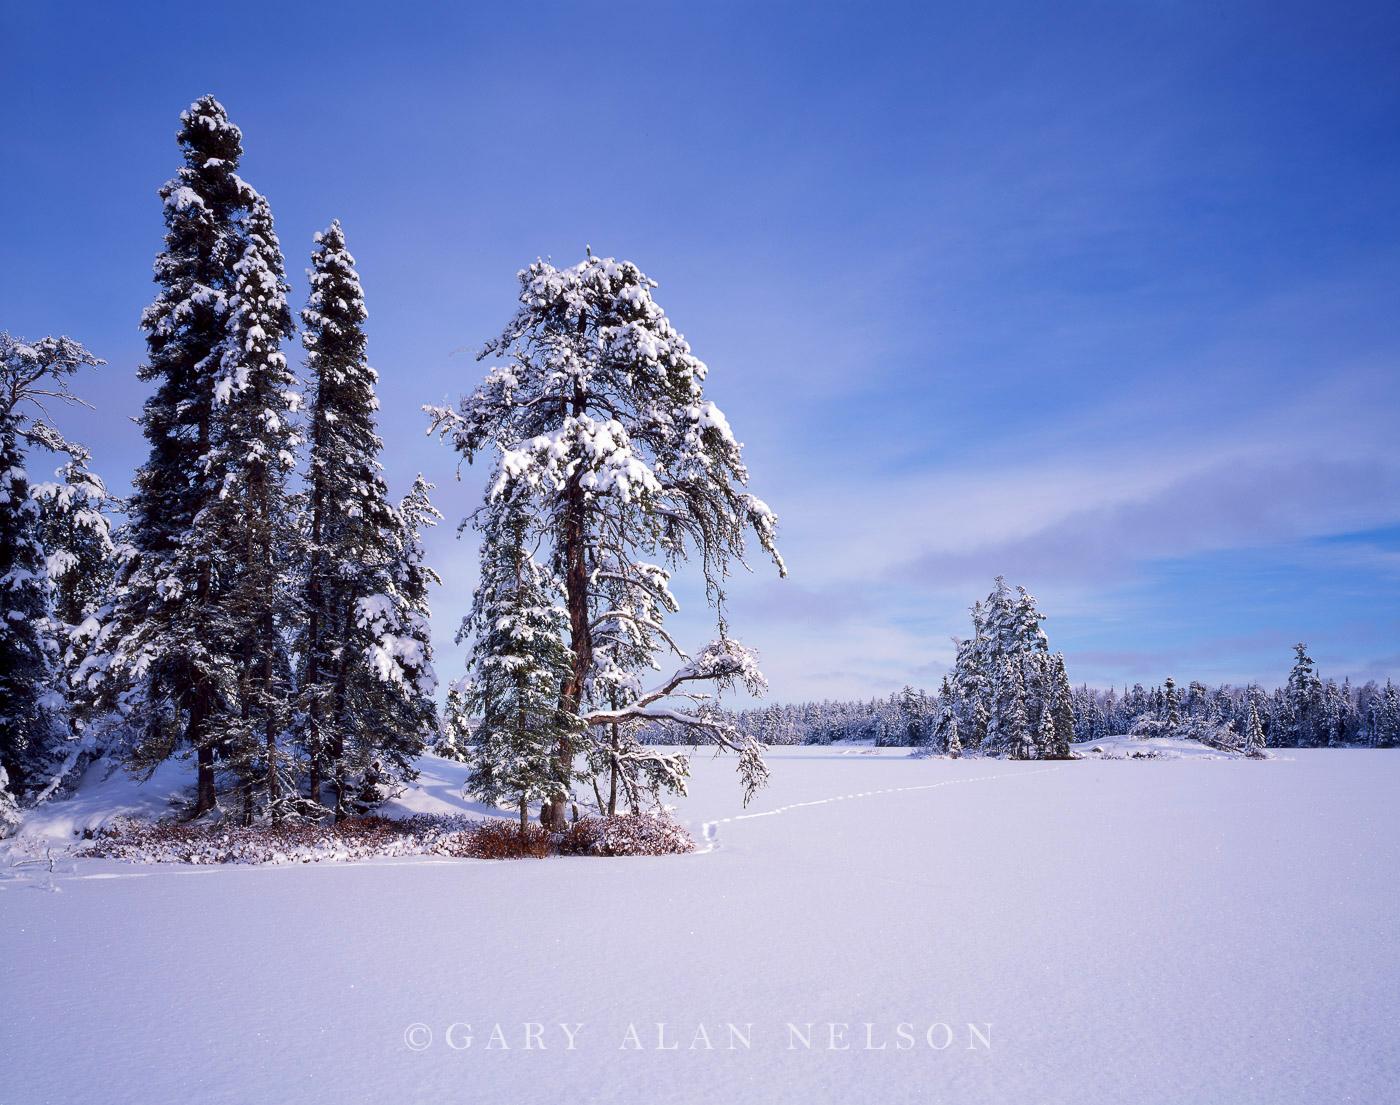 boundary waters,minnesota,winter, photo